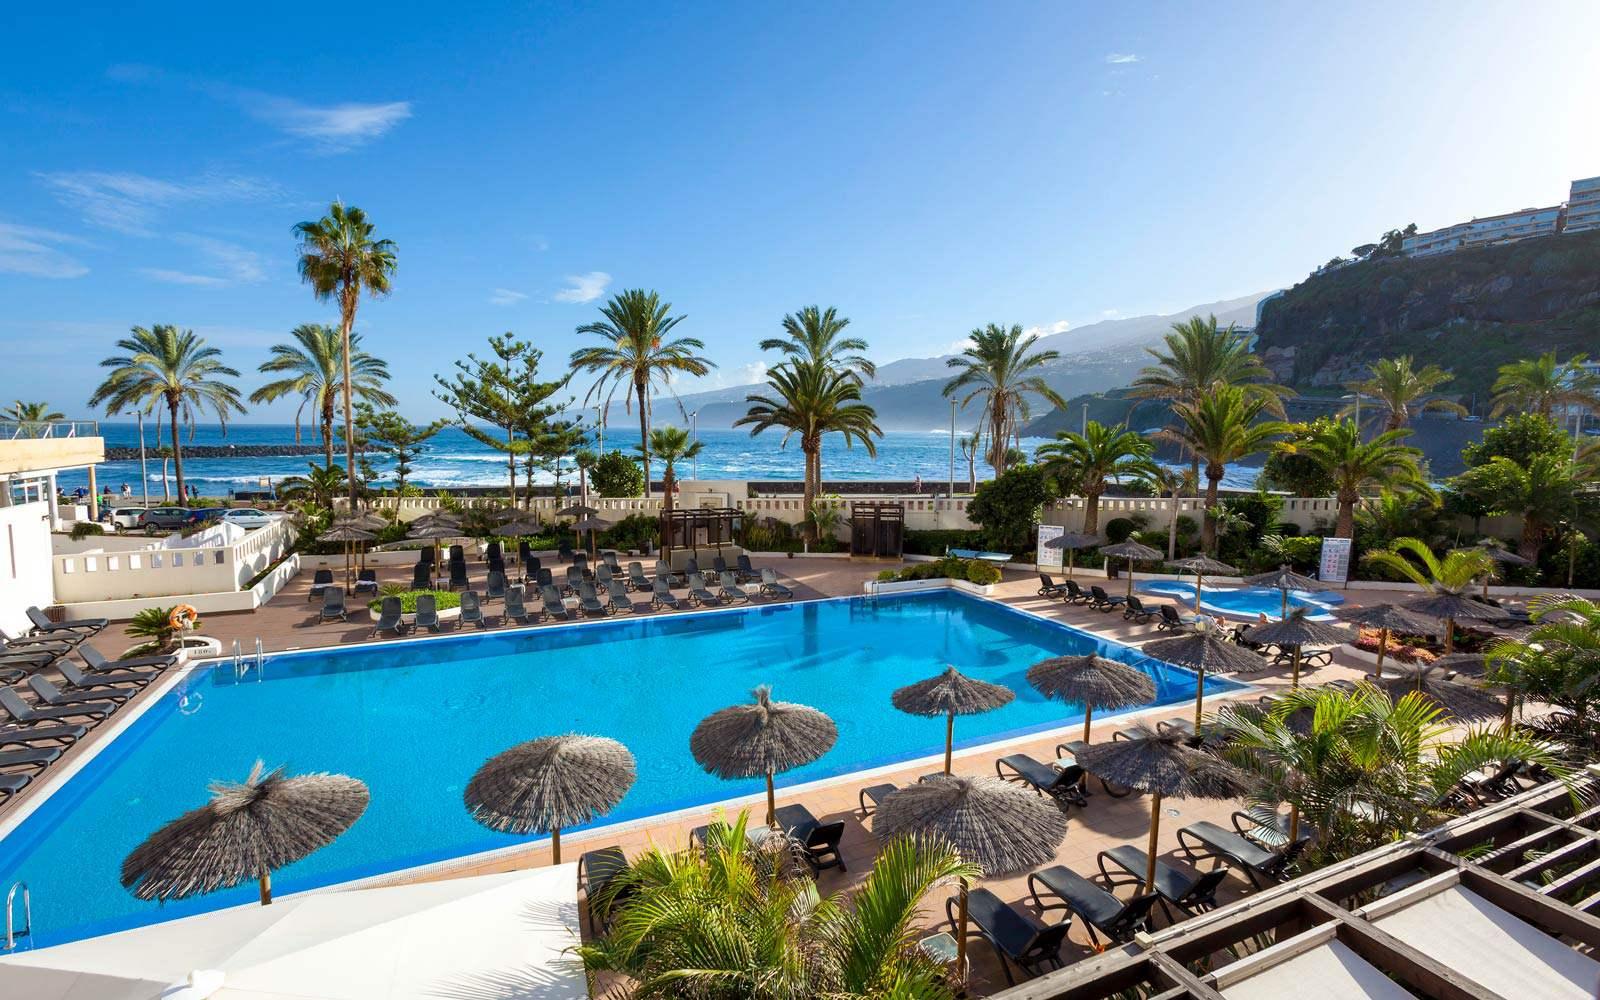 Sol Costa Atlantis Pool